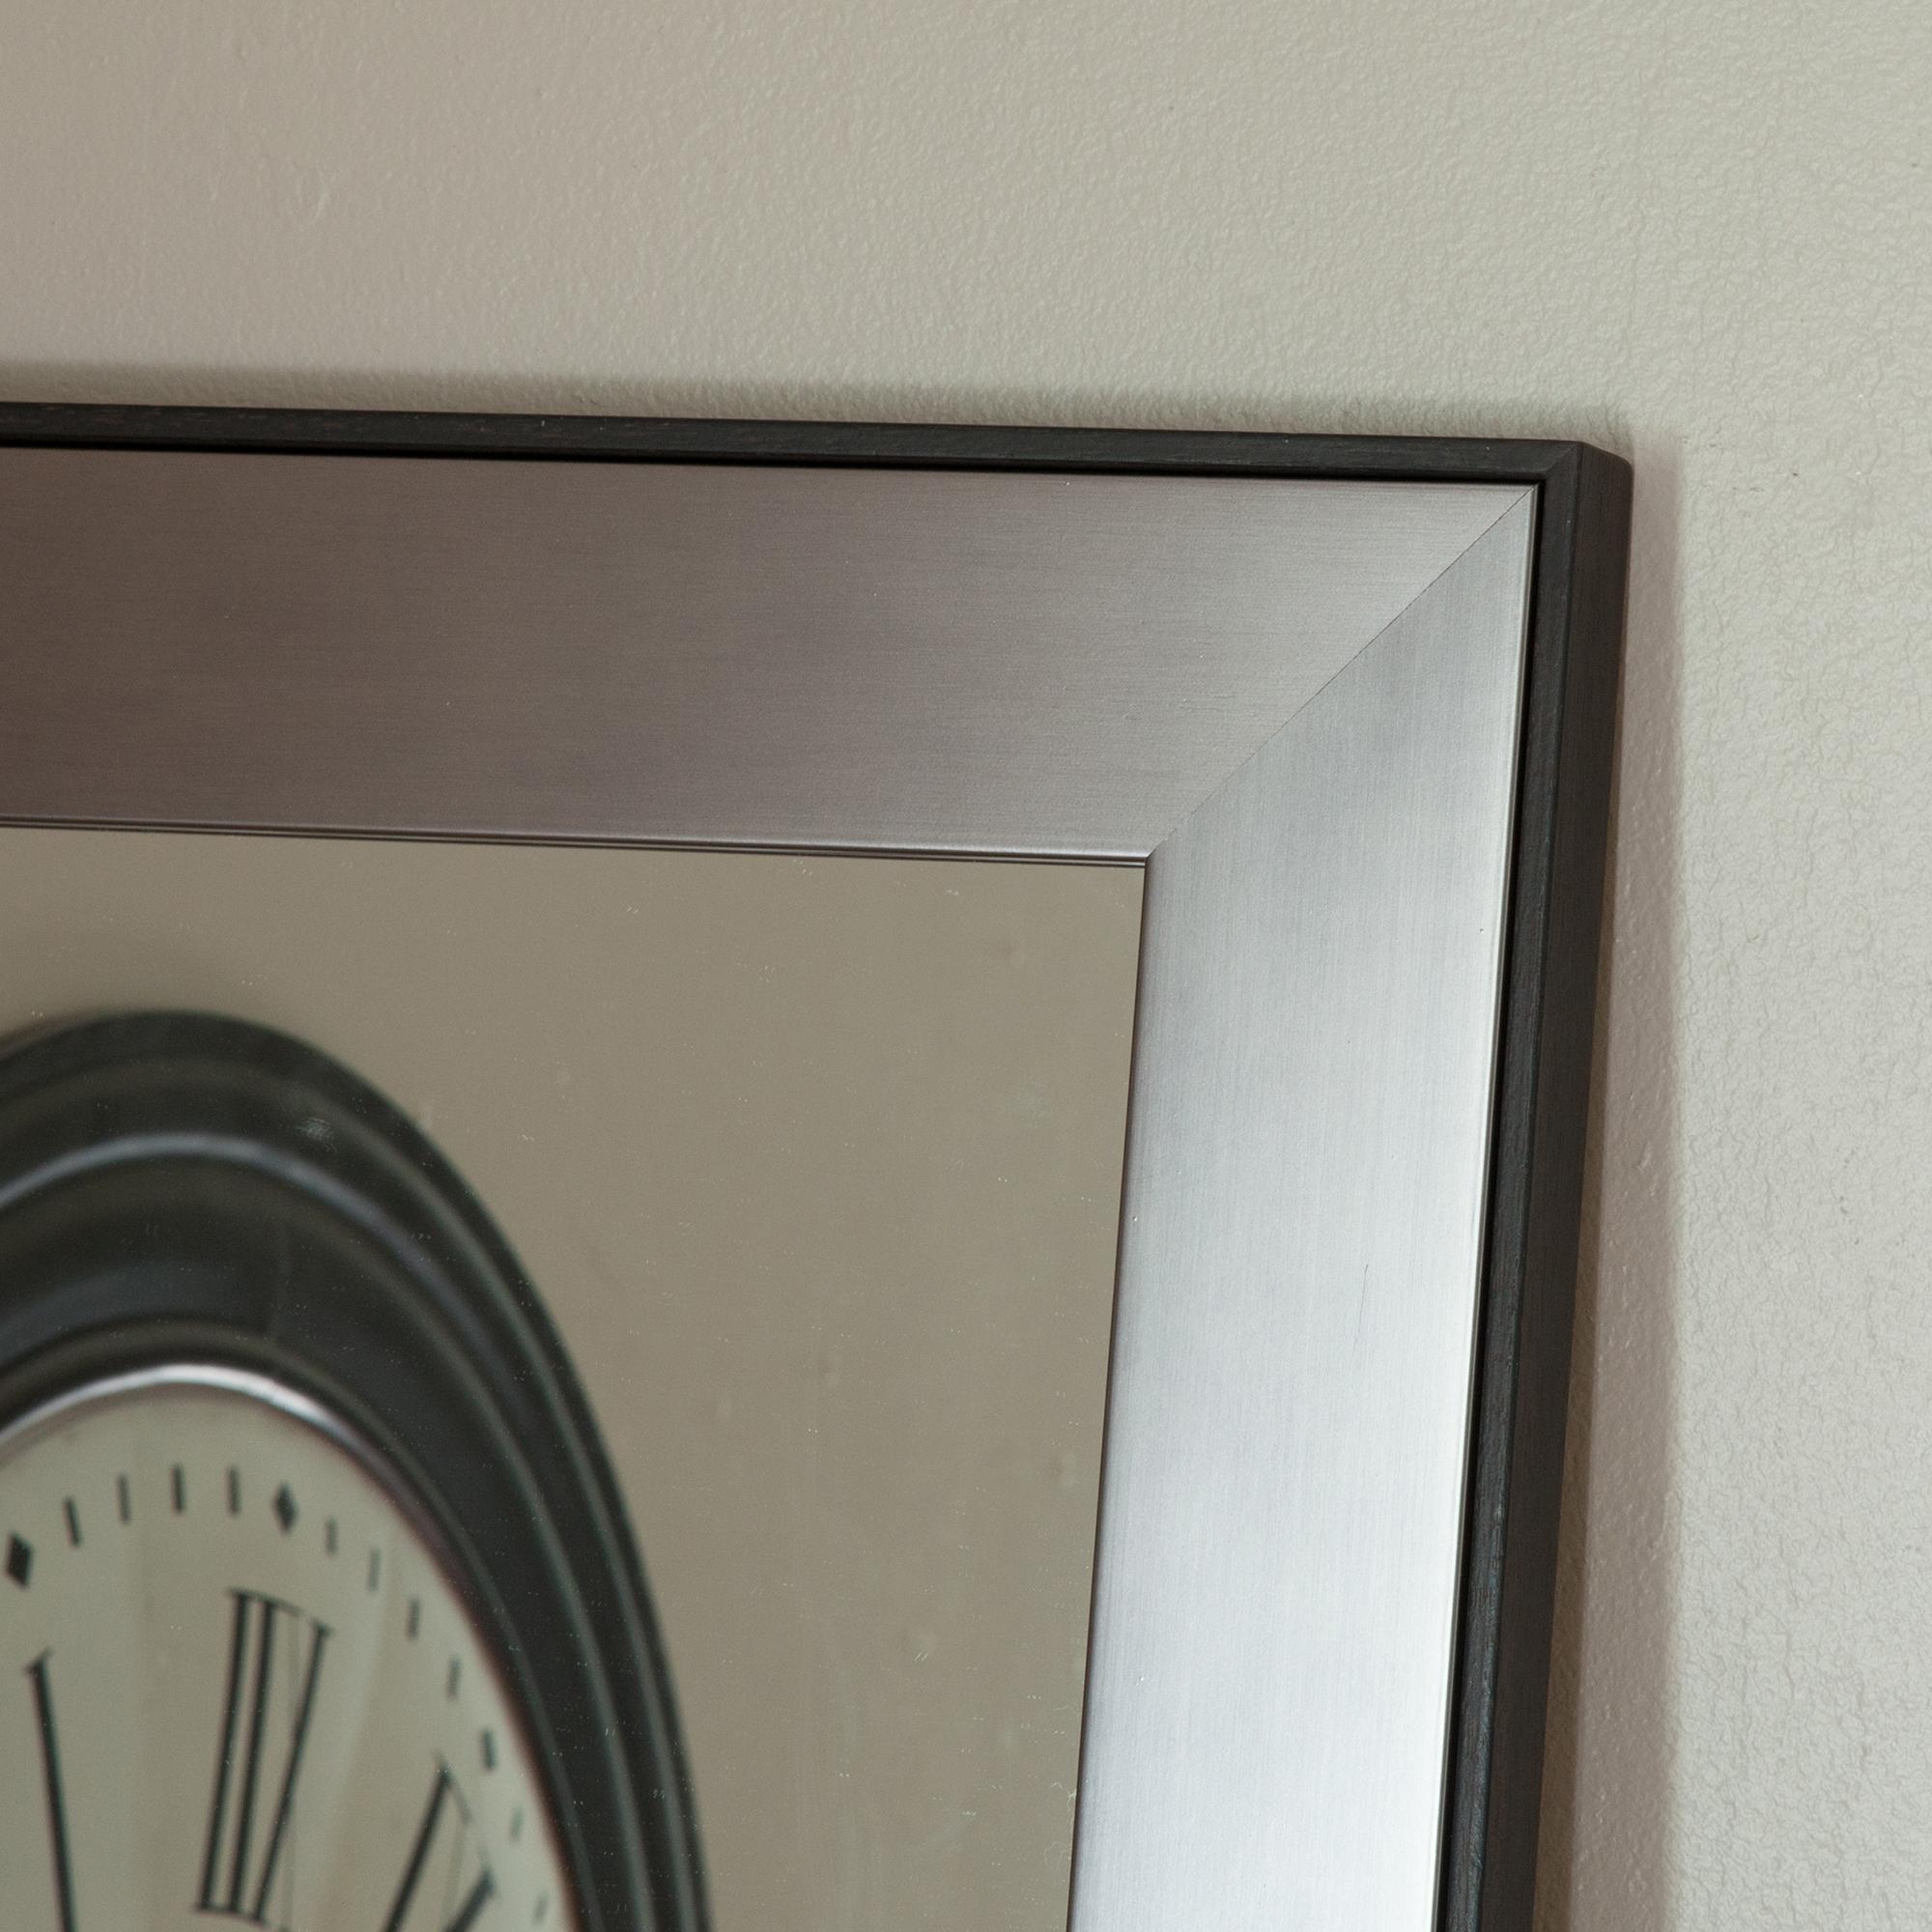 emde miroir mural rectangulaire length en bois 50 x 160 ForMiroir Mural Rectangulaire Bois 50 X 160 Cm Argent Length